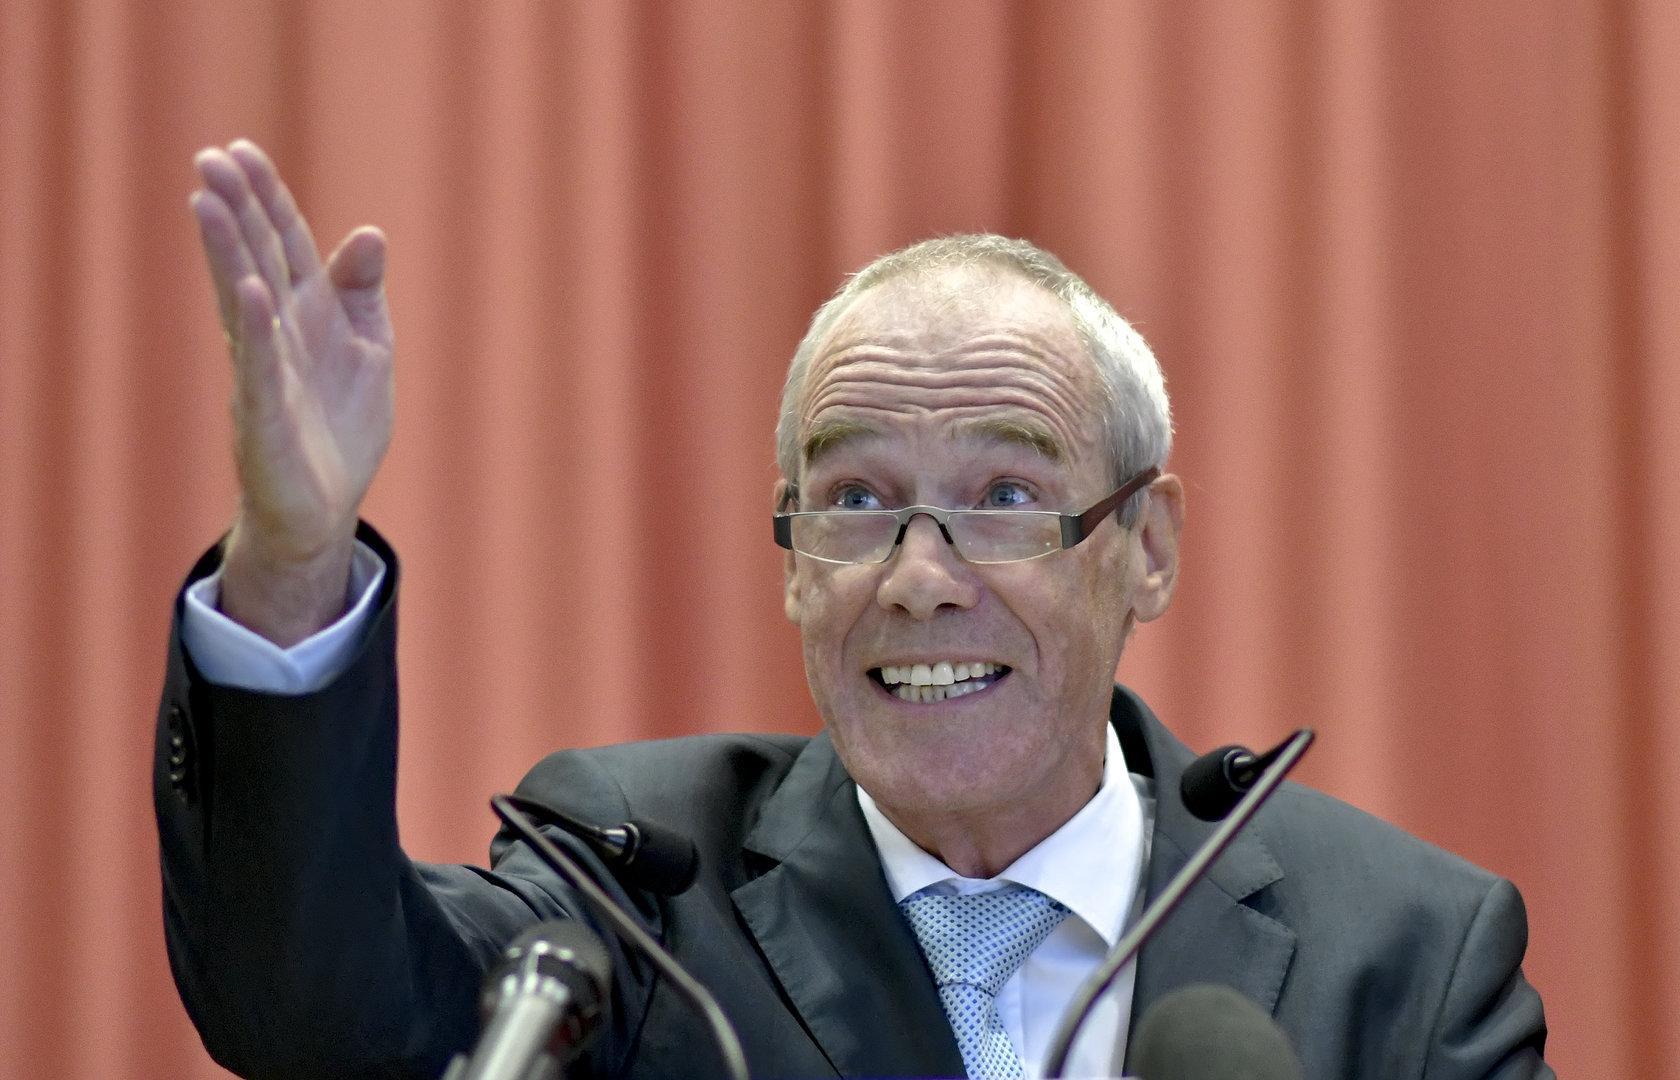 Kickl-Nachfolge: Eckart Ratz soll Innenministerium leiten